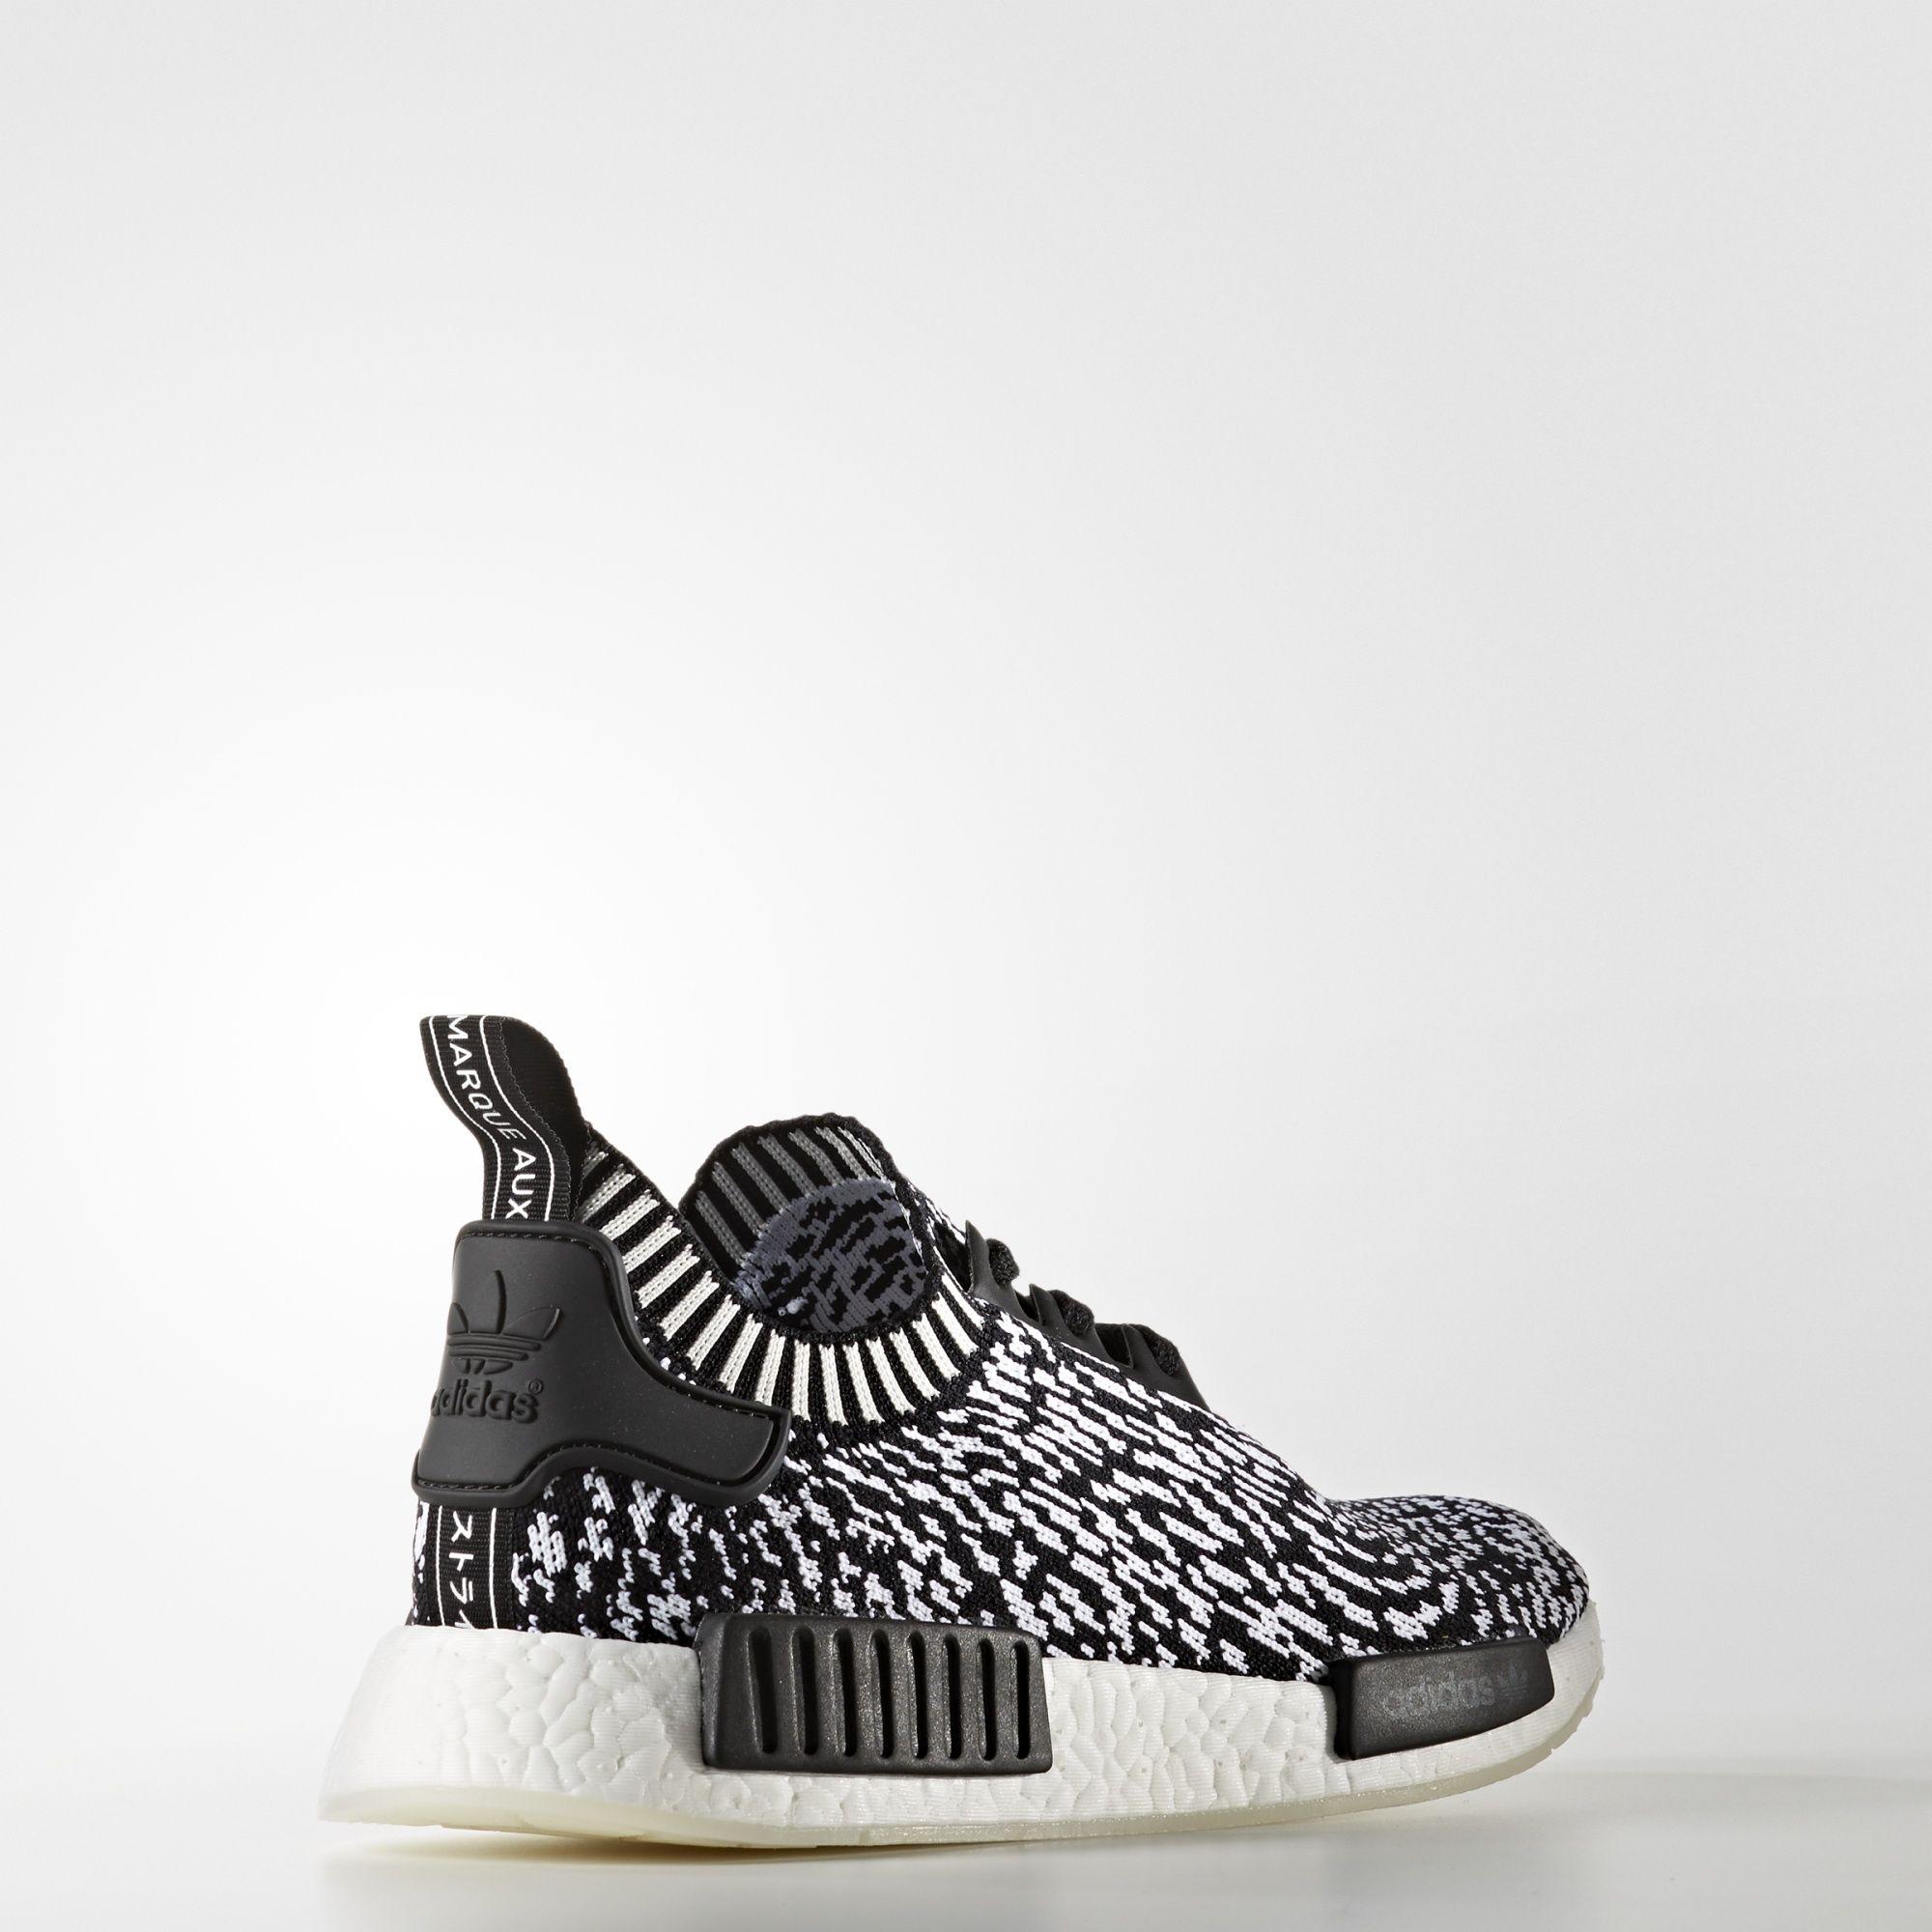 BY3013 adidas NMD R1 Primeknit Black White 3